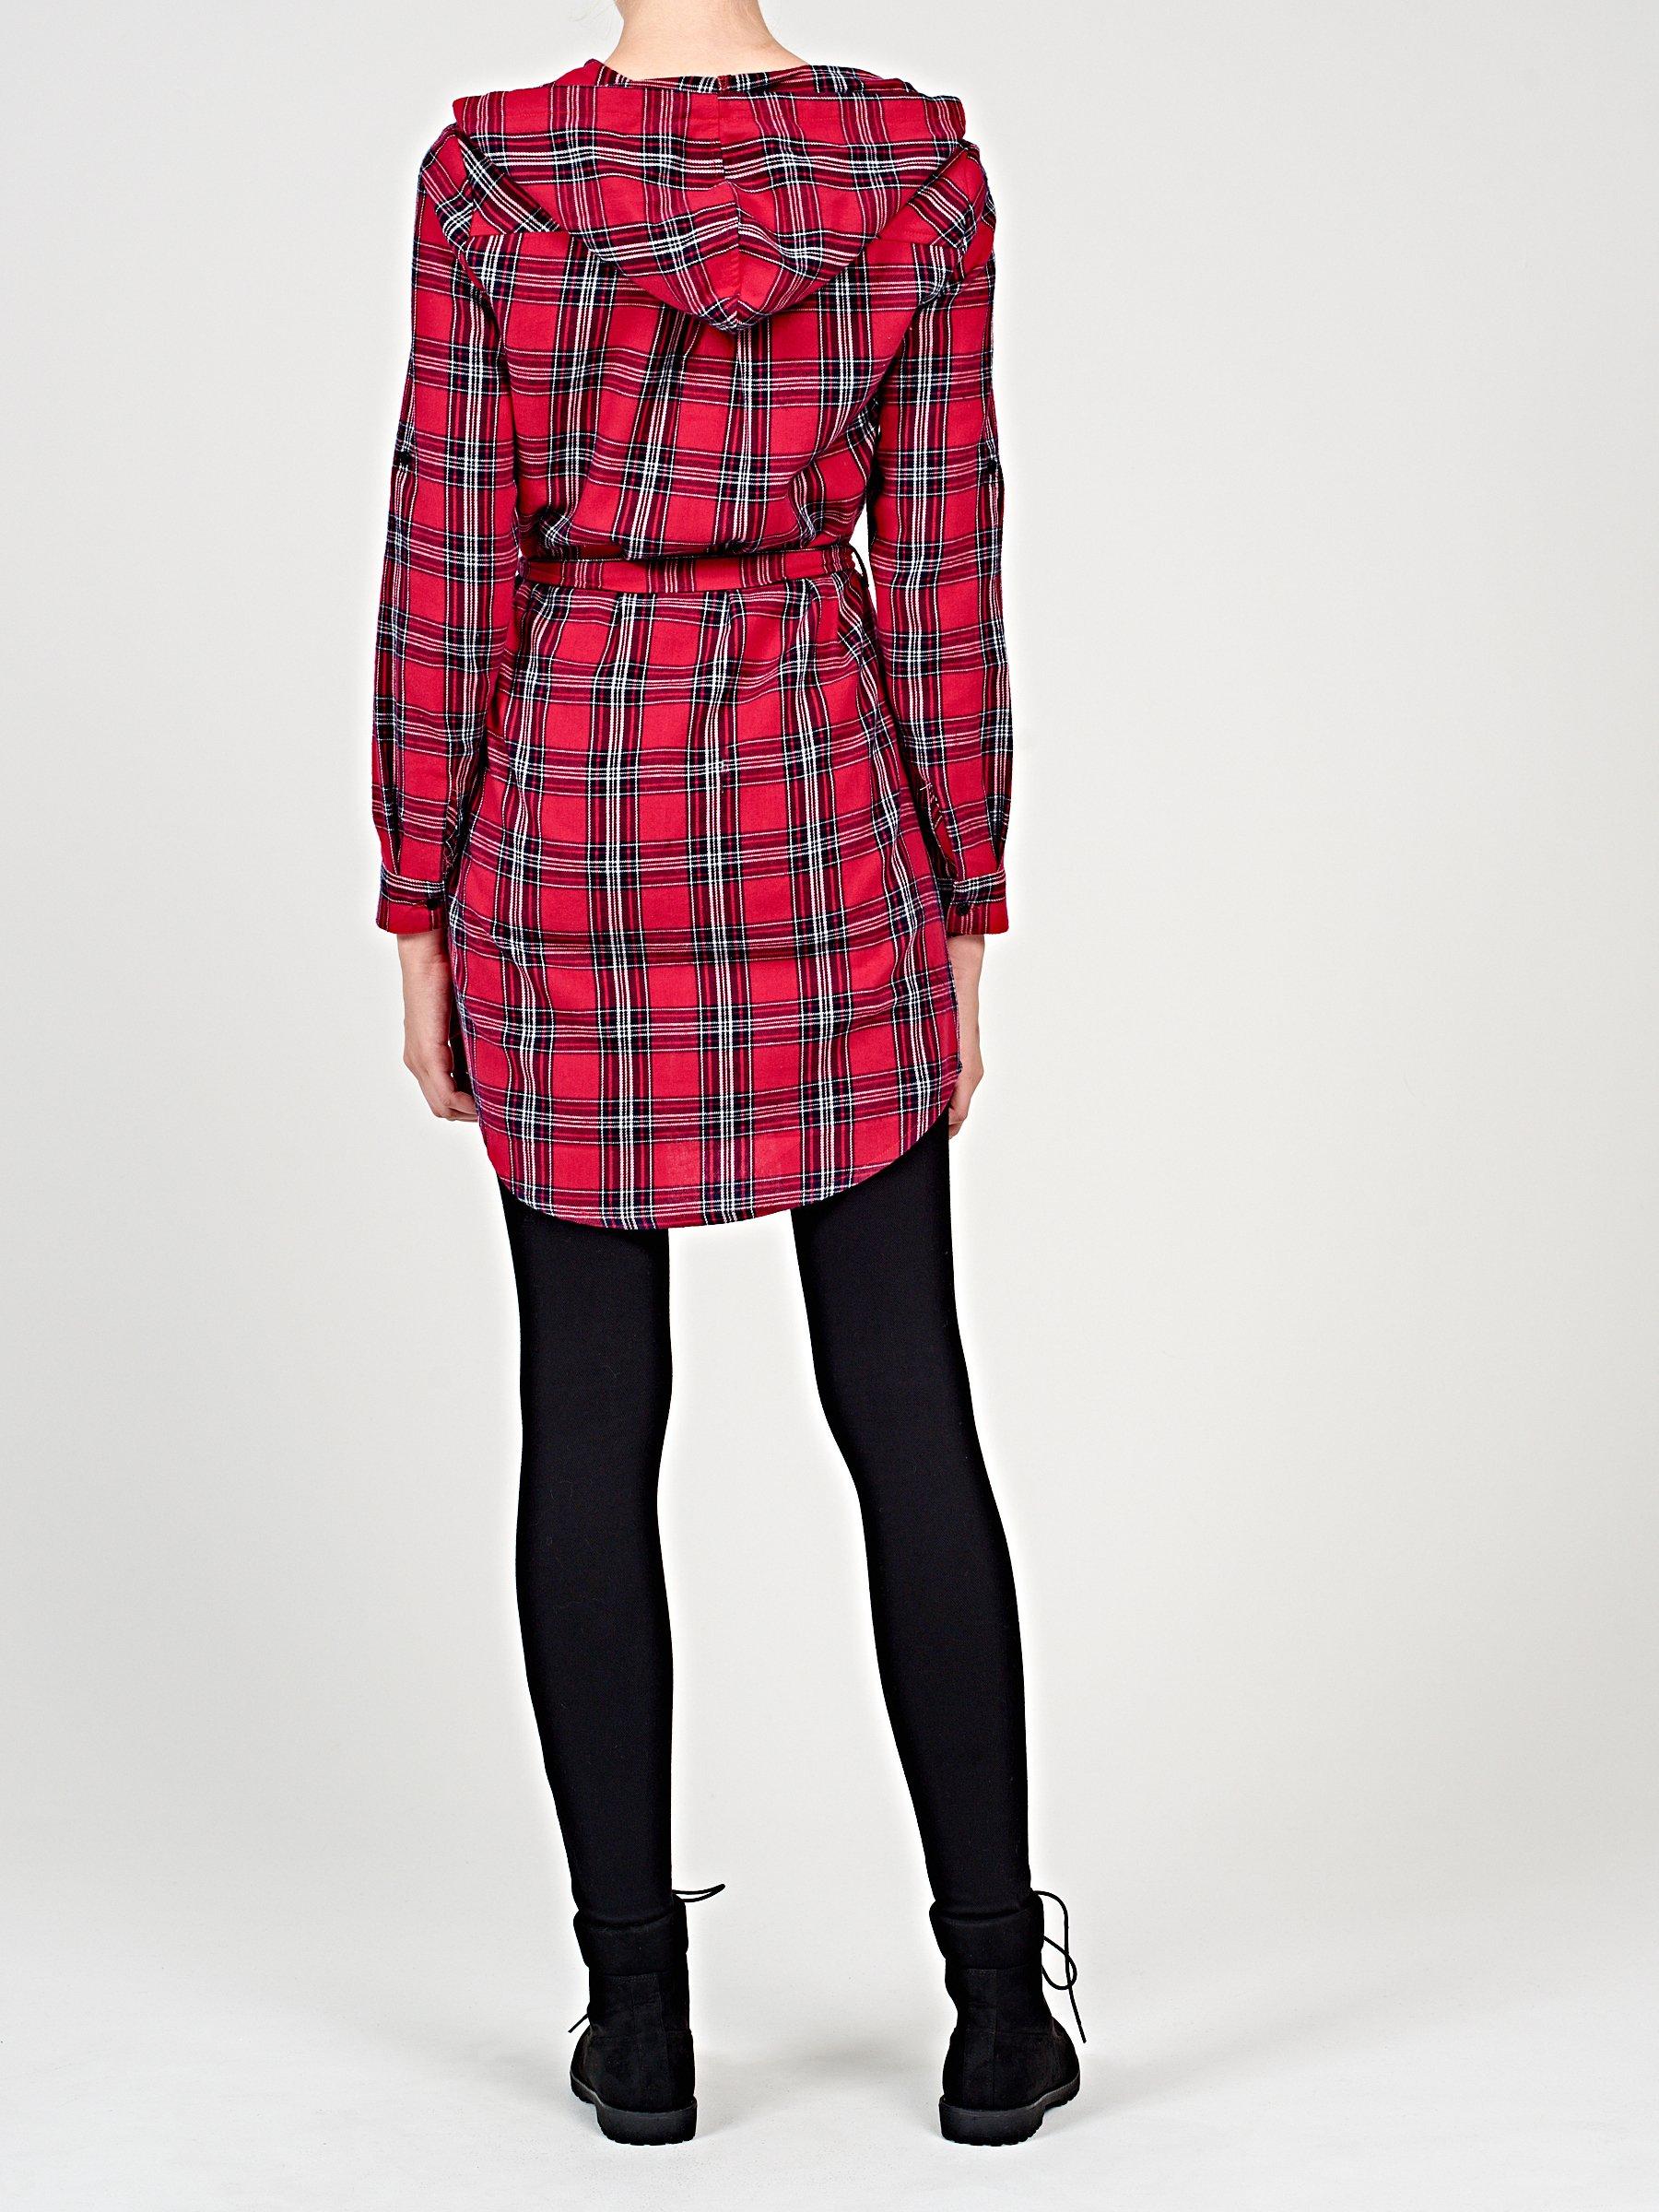 542df1c868fd Kostkované košilové šaty s kapucí